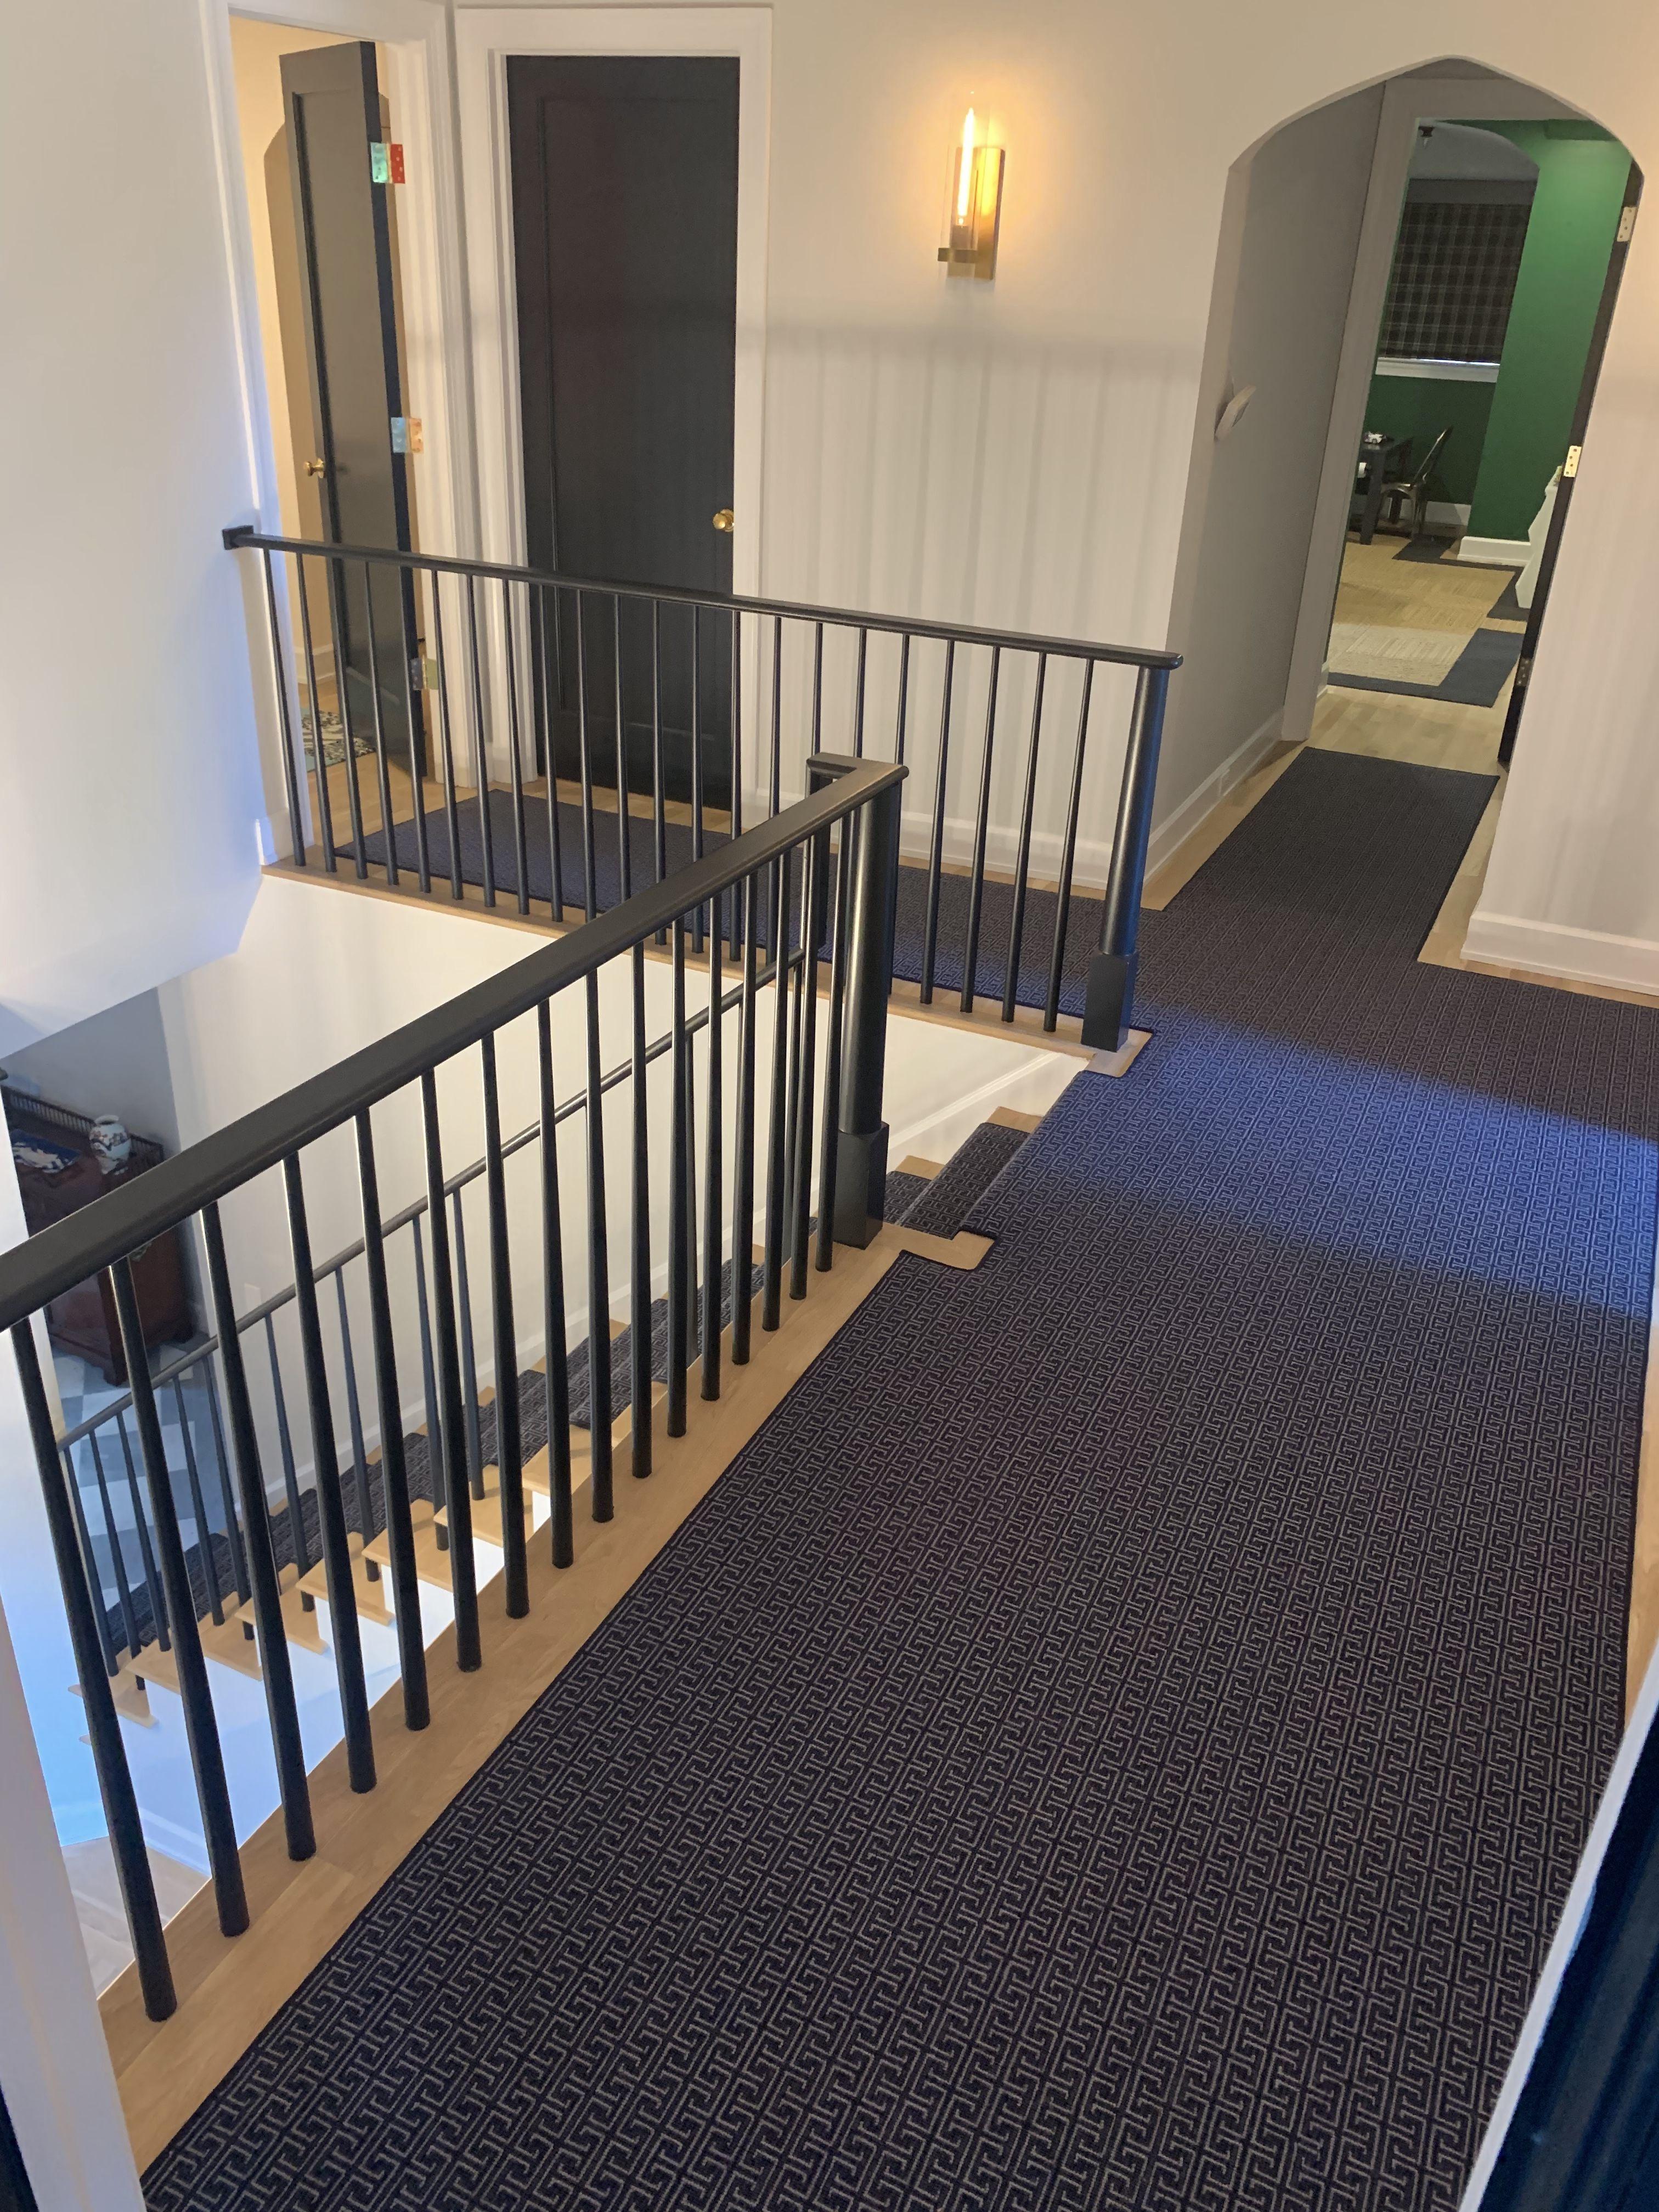 Custom Wool Runner On Steps And Hallways Featuring Stanton Carpet Stanton Carpet Vinyl Flooring Laminate Flooring